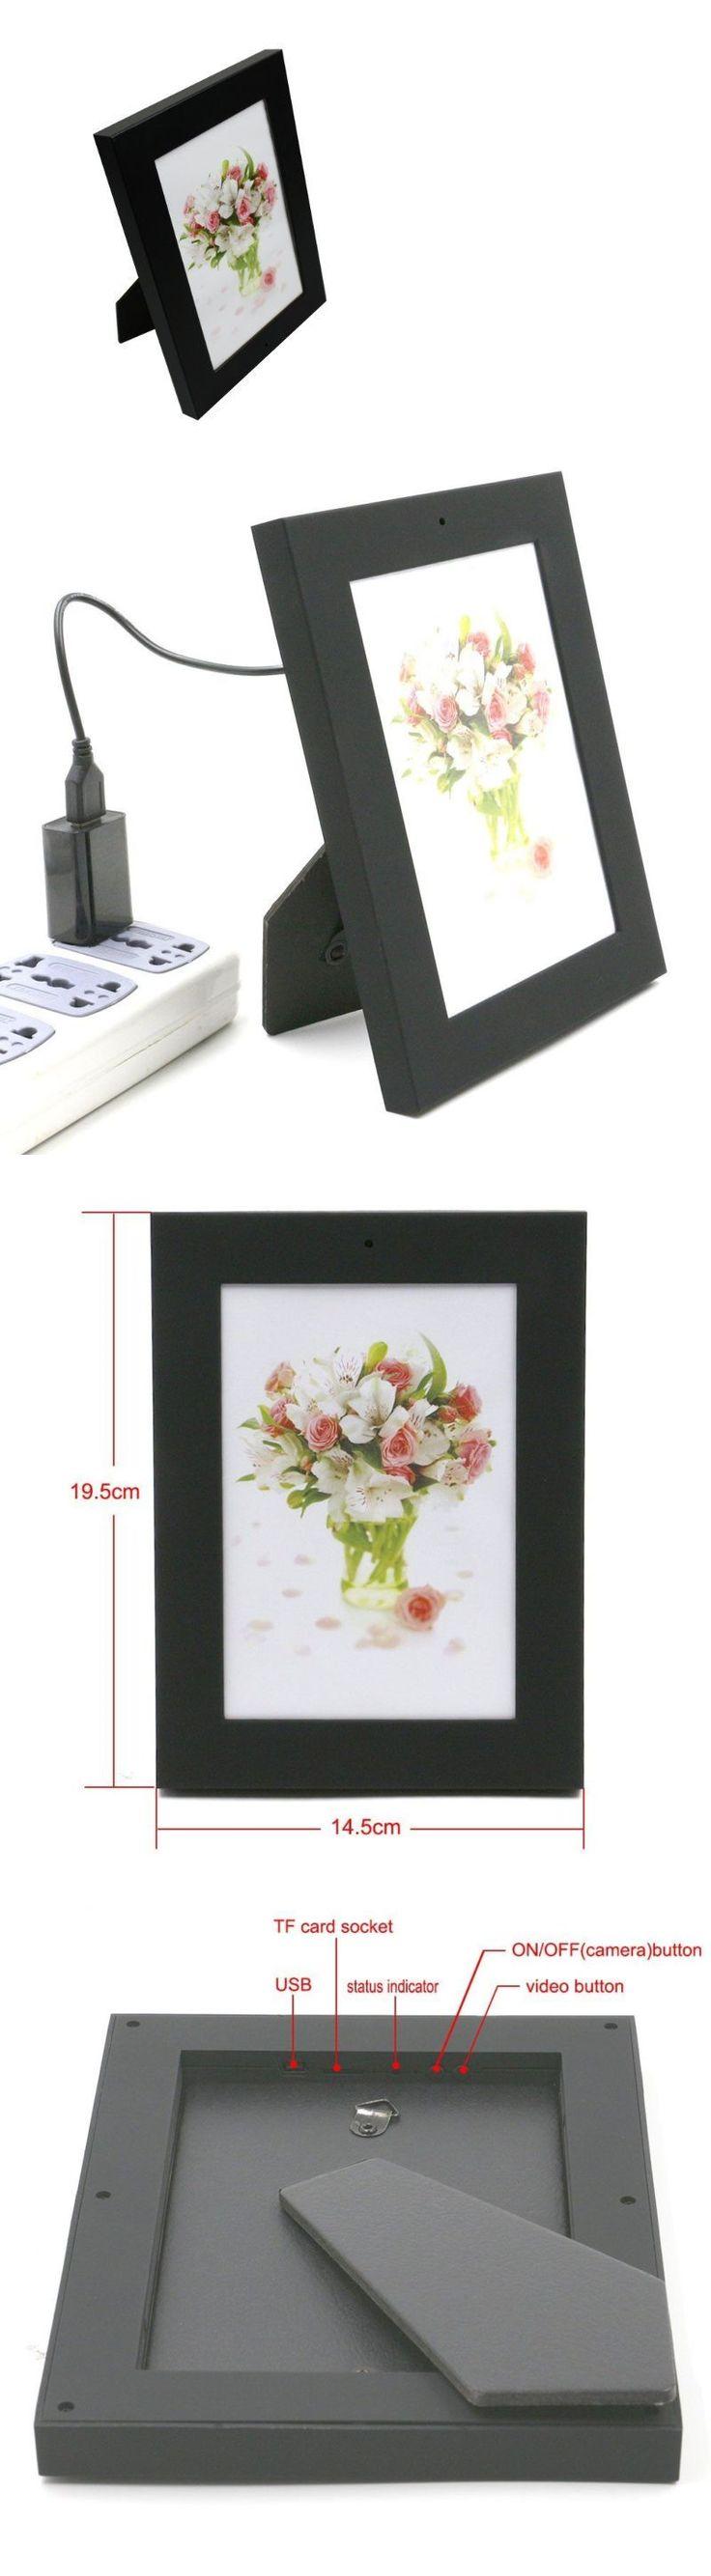 Surveillance Gadgets: Picture Frame Hidden Nanny Spy Hd Video Camera ...